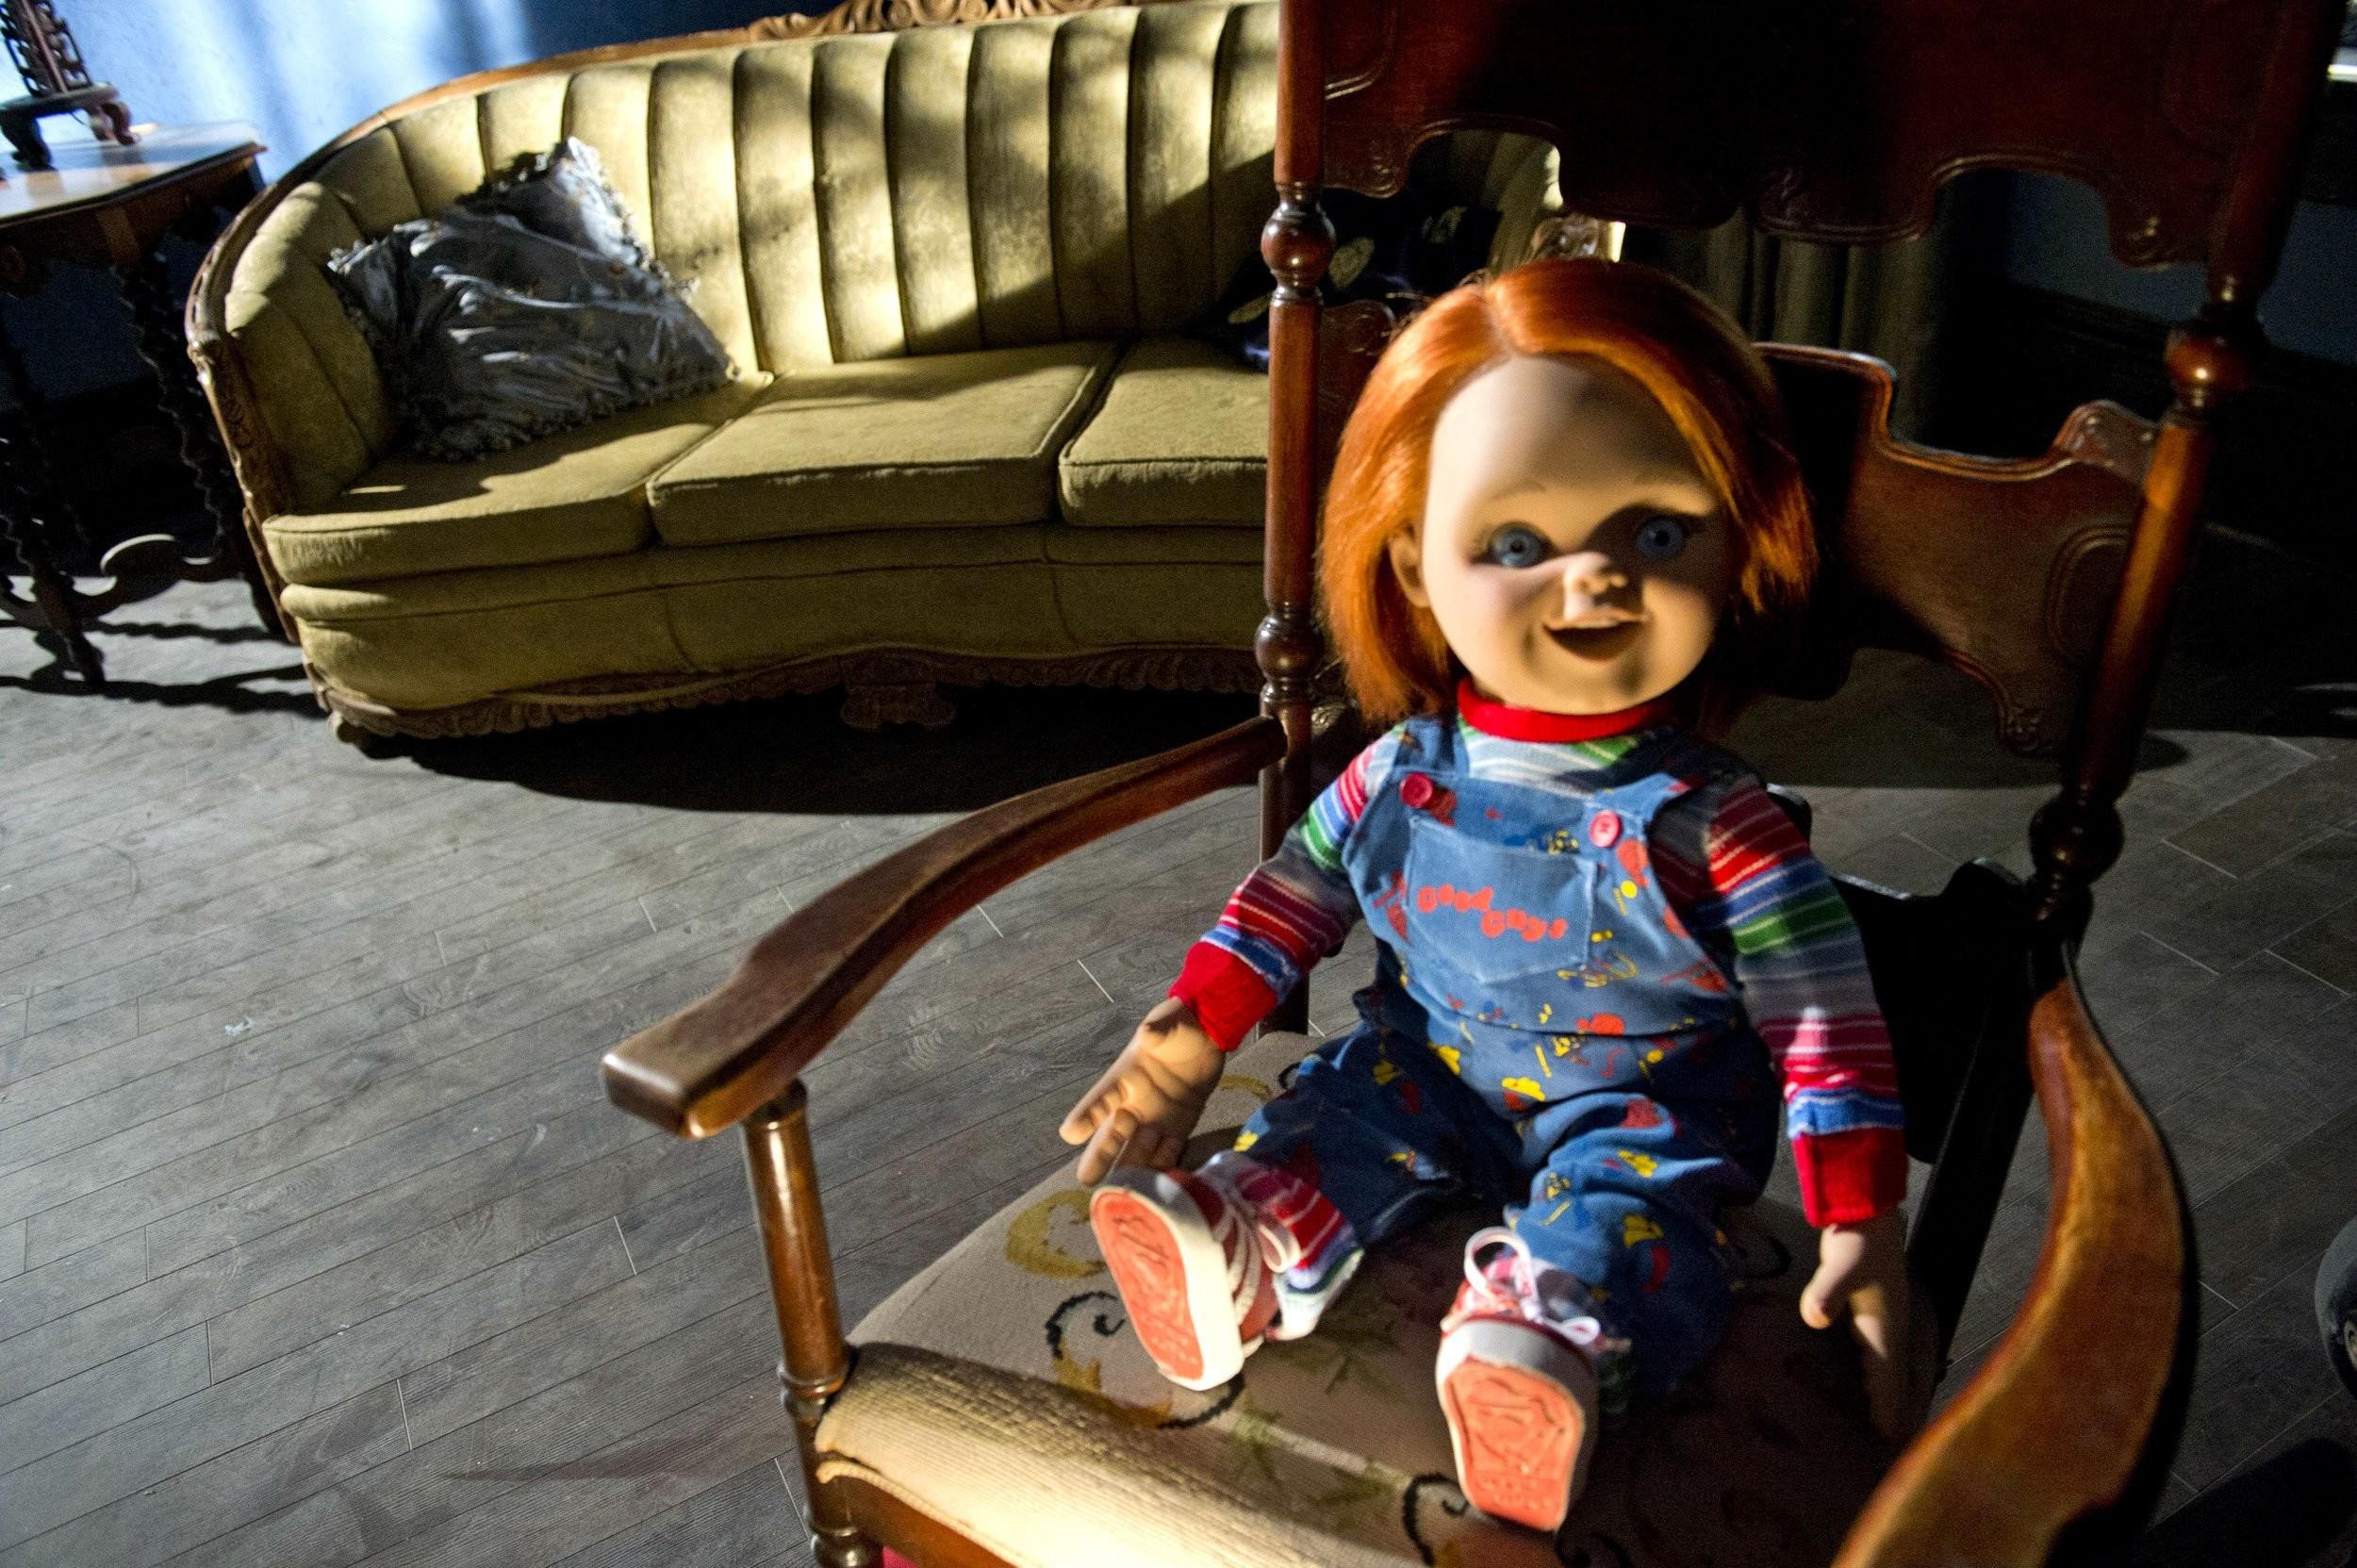 CHILDS PLAY chucky dark horror creepy scary (17) wallpaper      235517   WallpaperUP